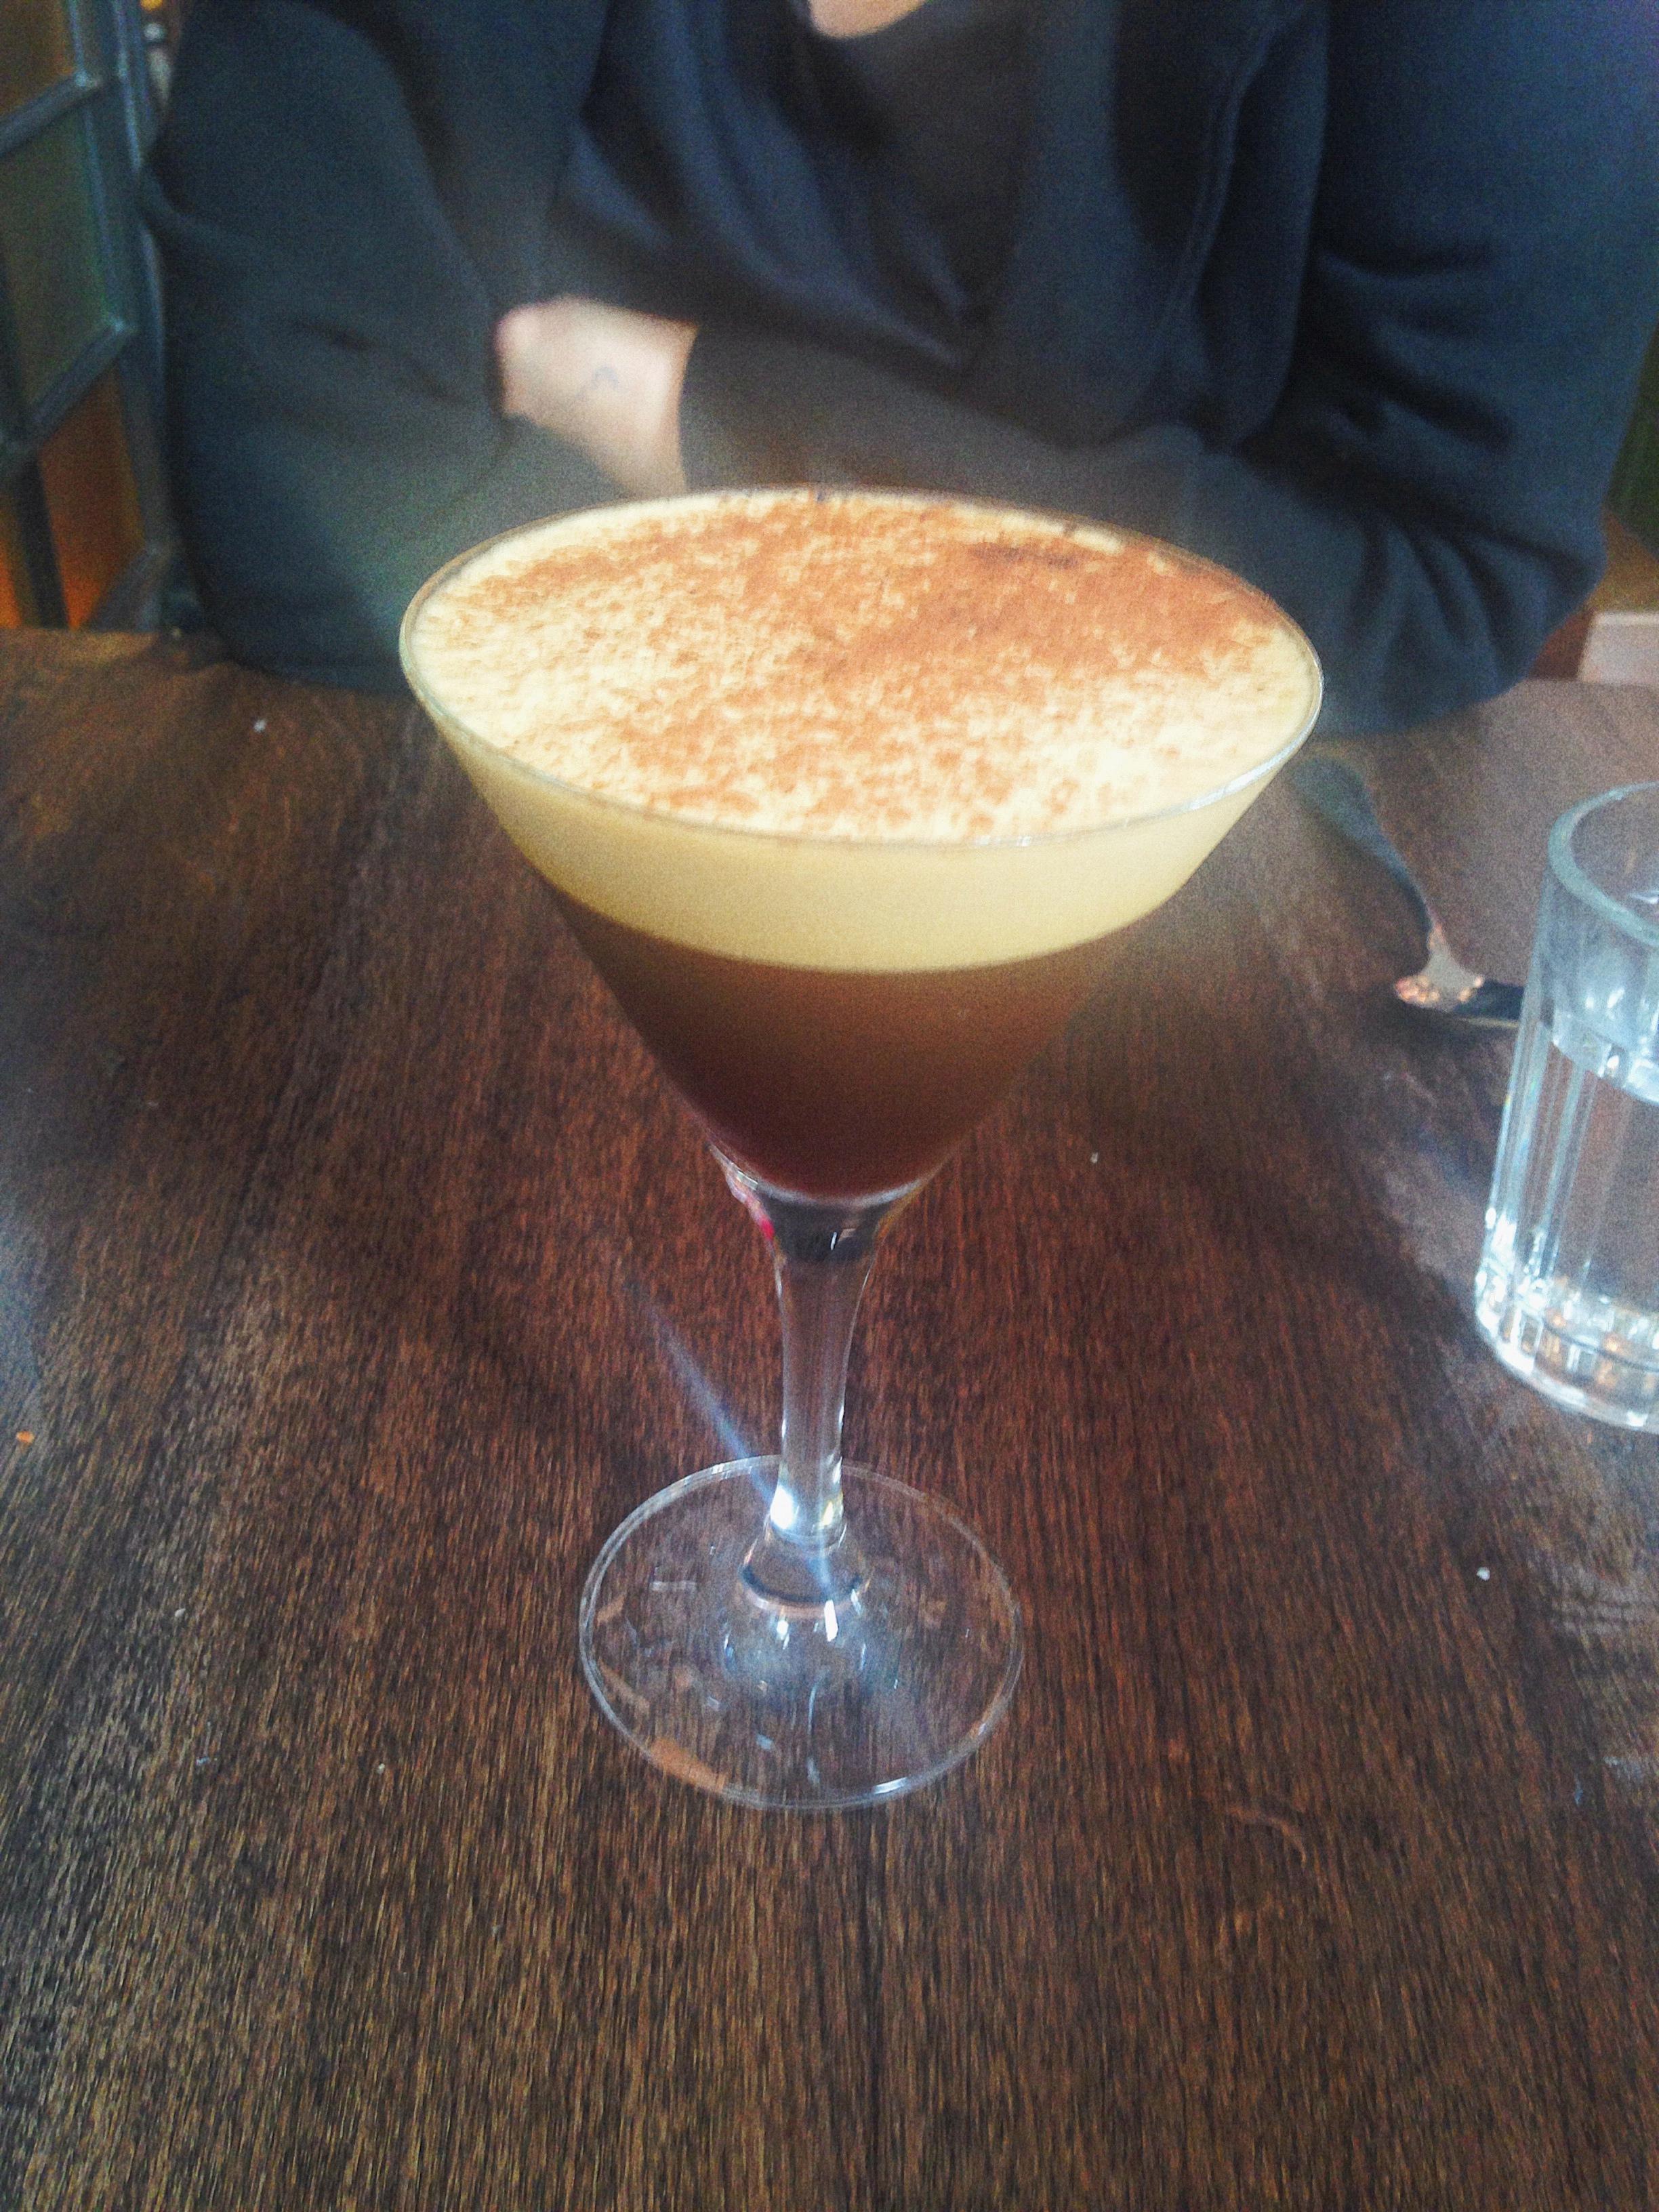 Holy Espresso: Tia Maria, hazelnut liqueur & amaretto with a double espresso shot, dusted with cocoa